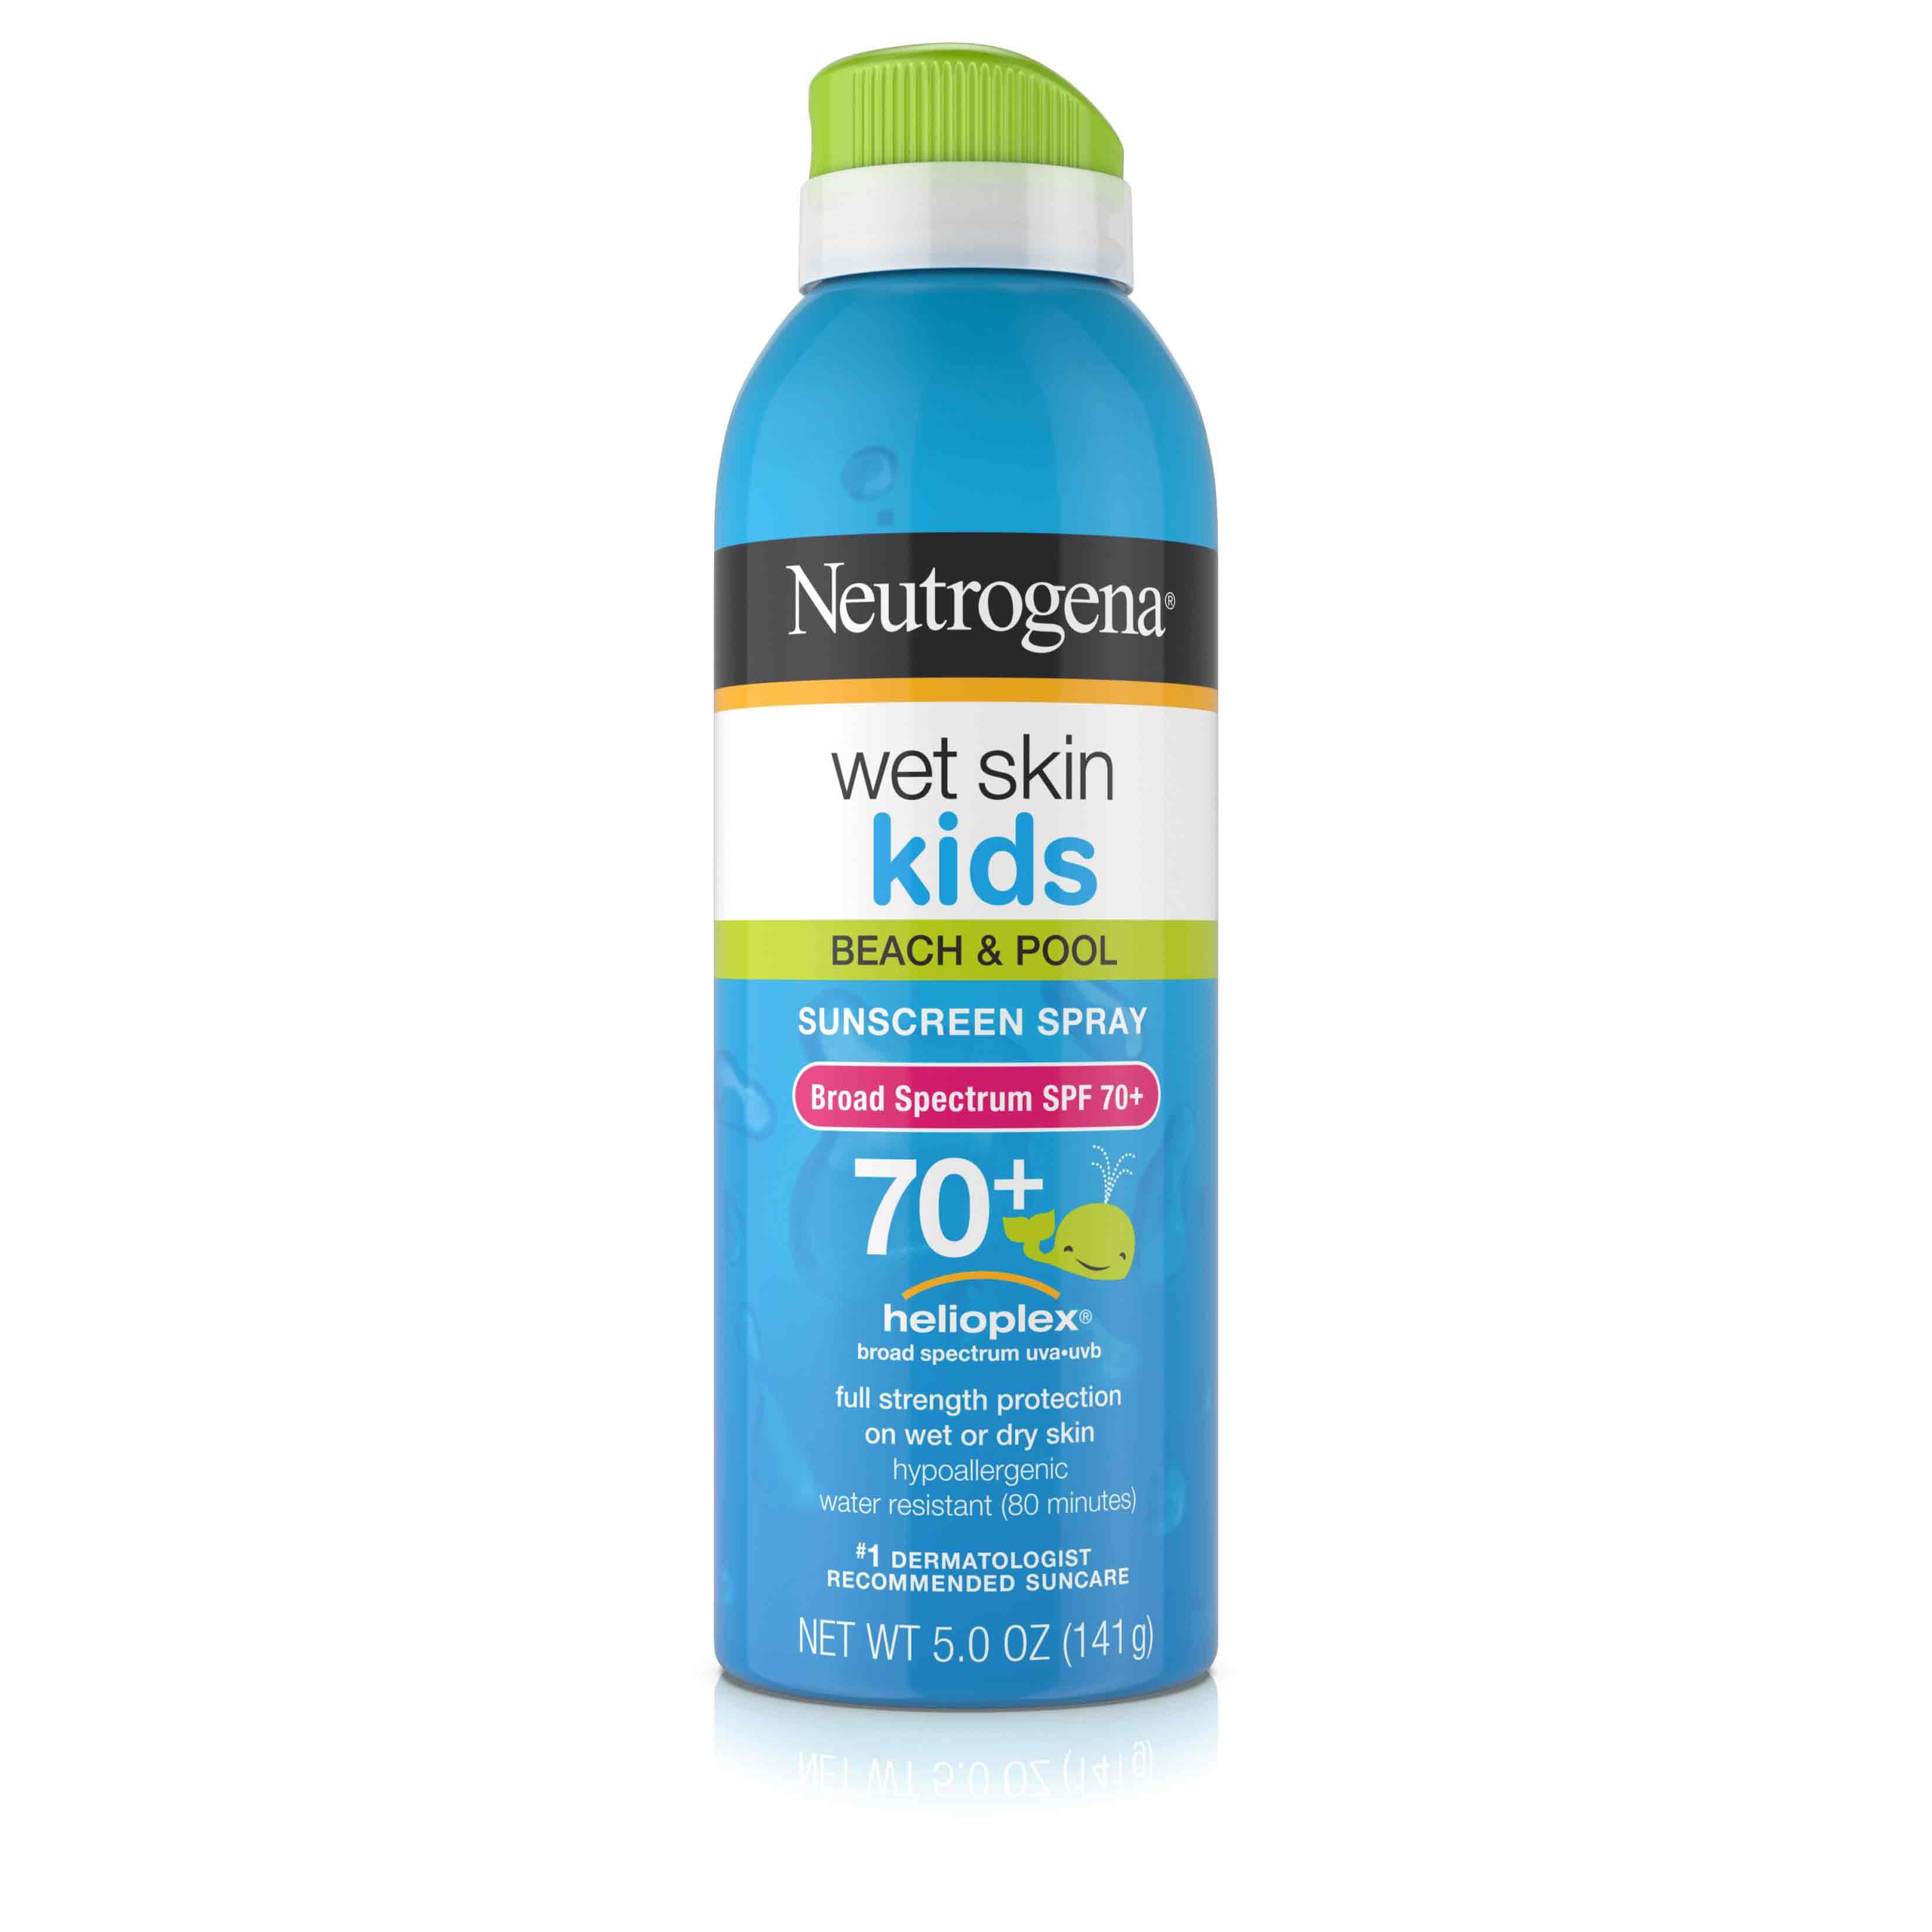 Wet Skin Kids Sunscreen Spray Broad Spectrum SPF 70+